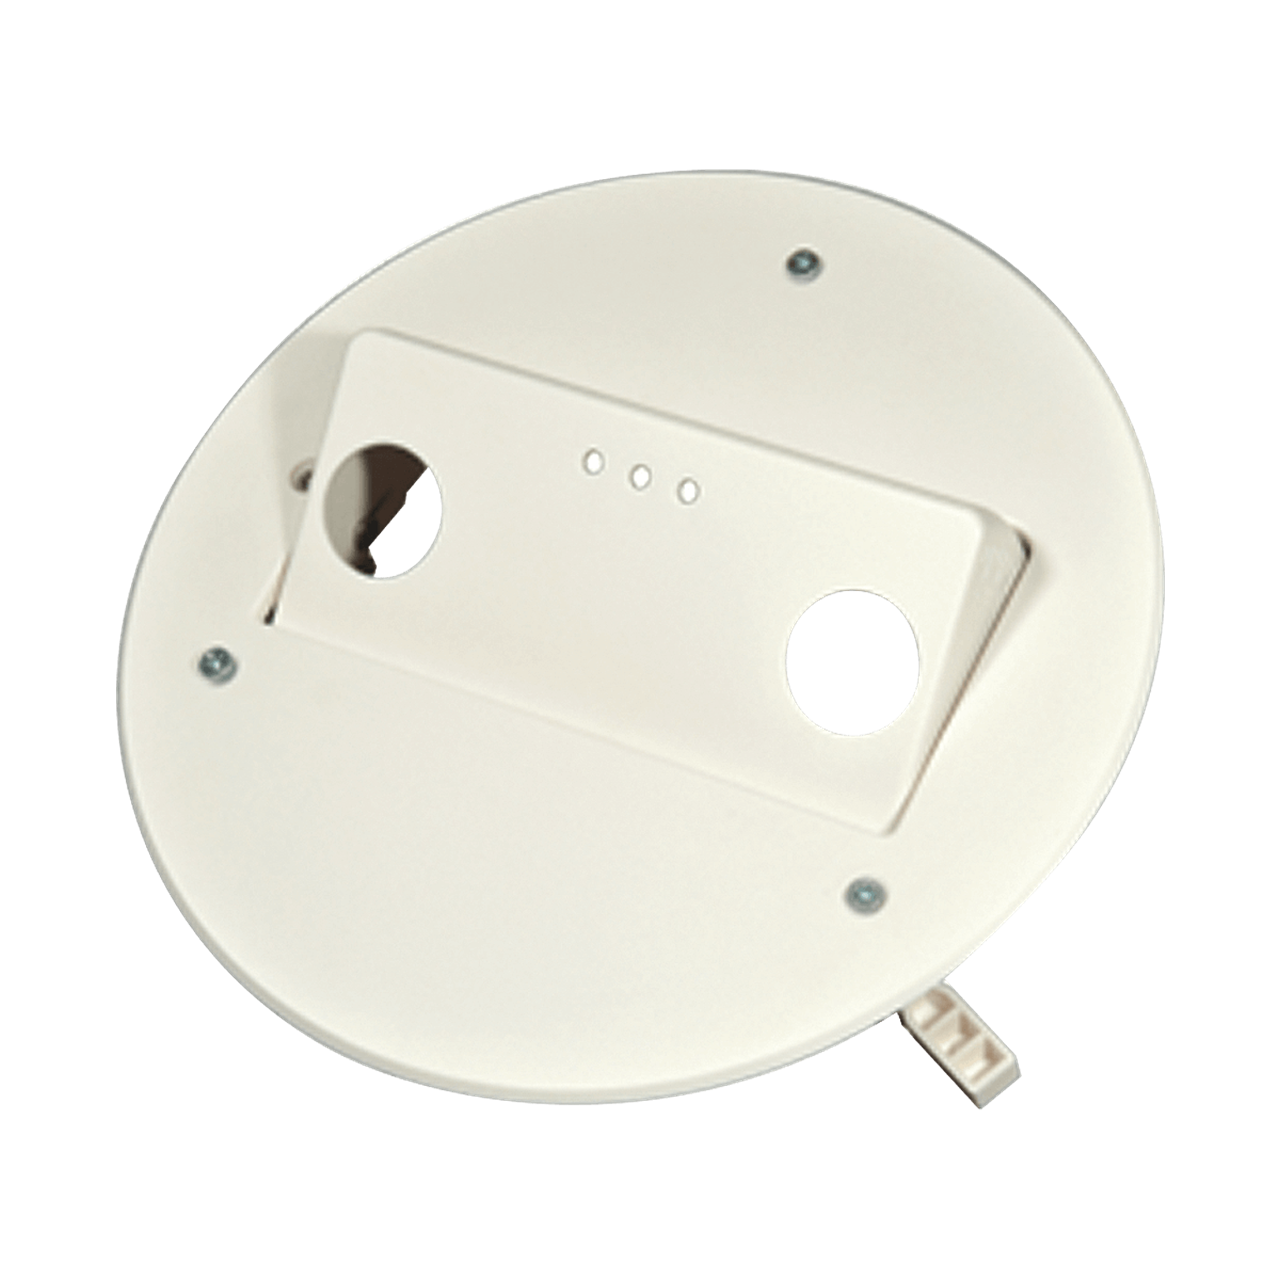 Sensormatic Recessed Tilting Mount for Stereo Overhead Traffic Sensor in Armenia Vantag LLC